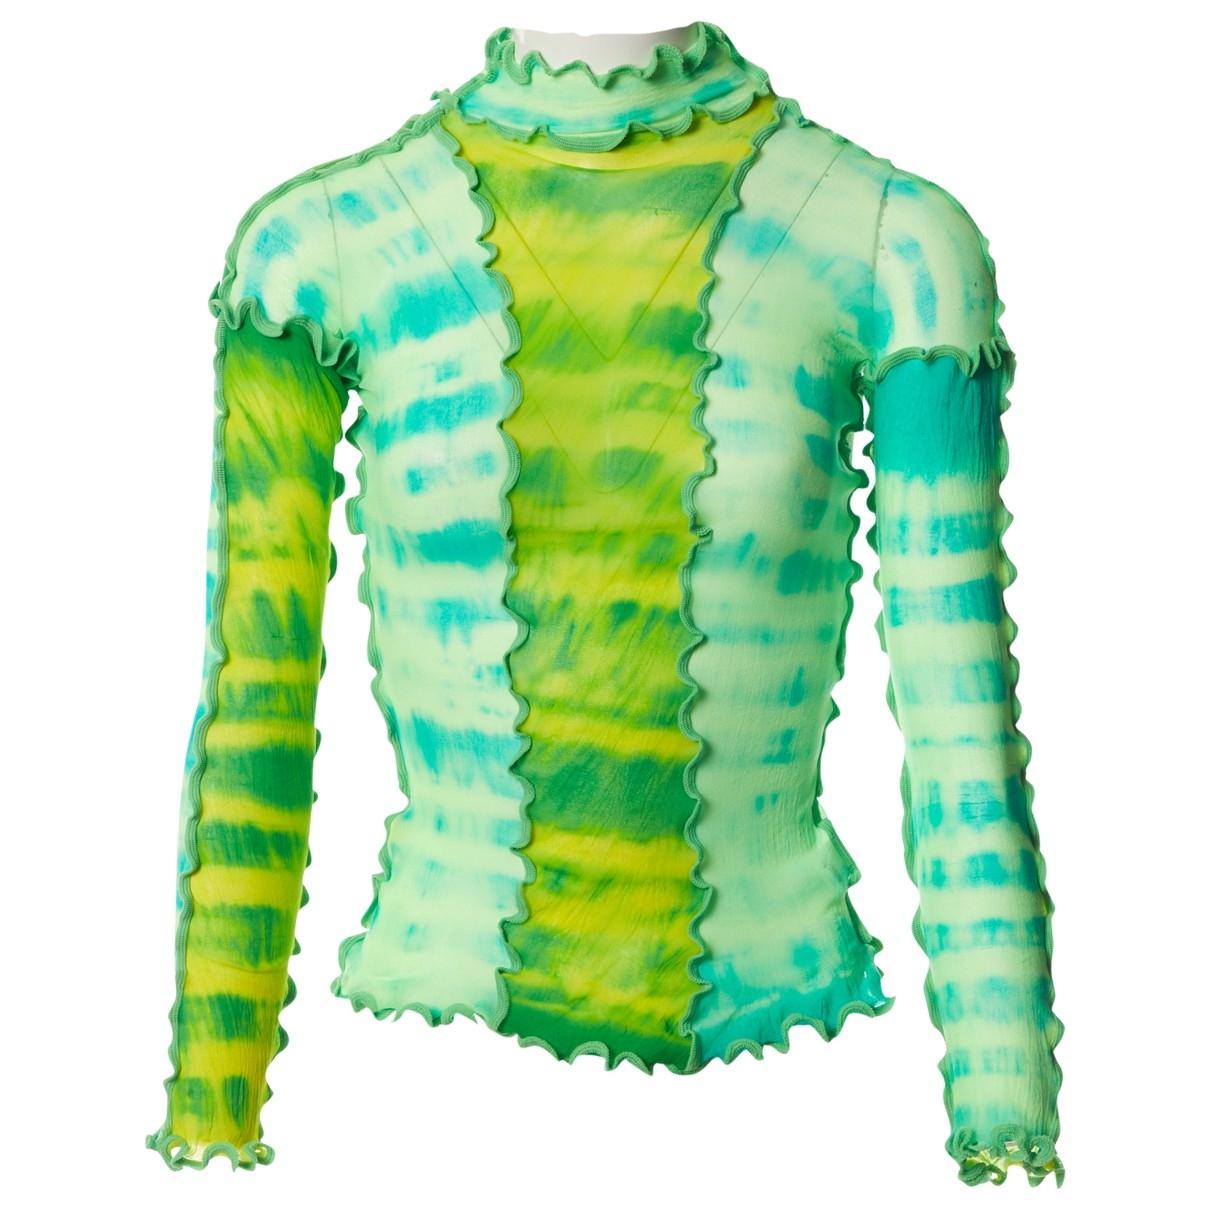 Asai \N Green  top for Women One Size FR